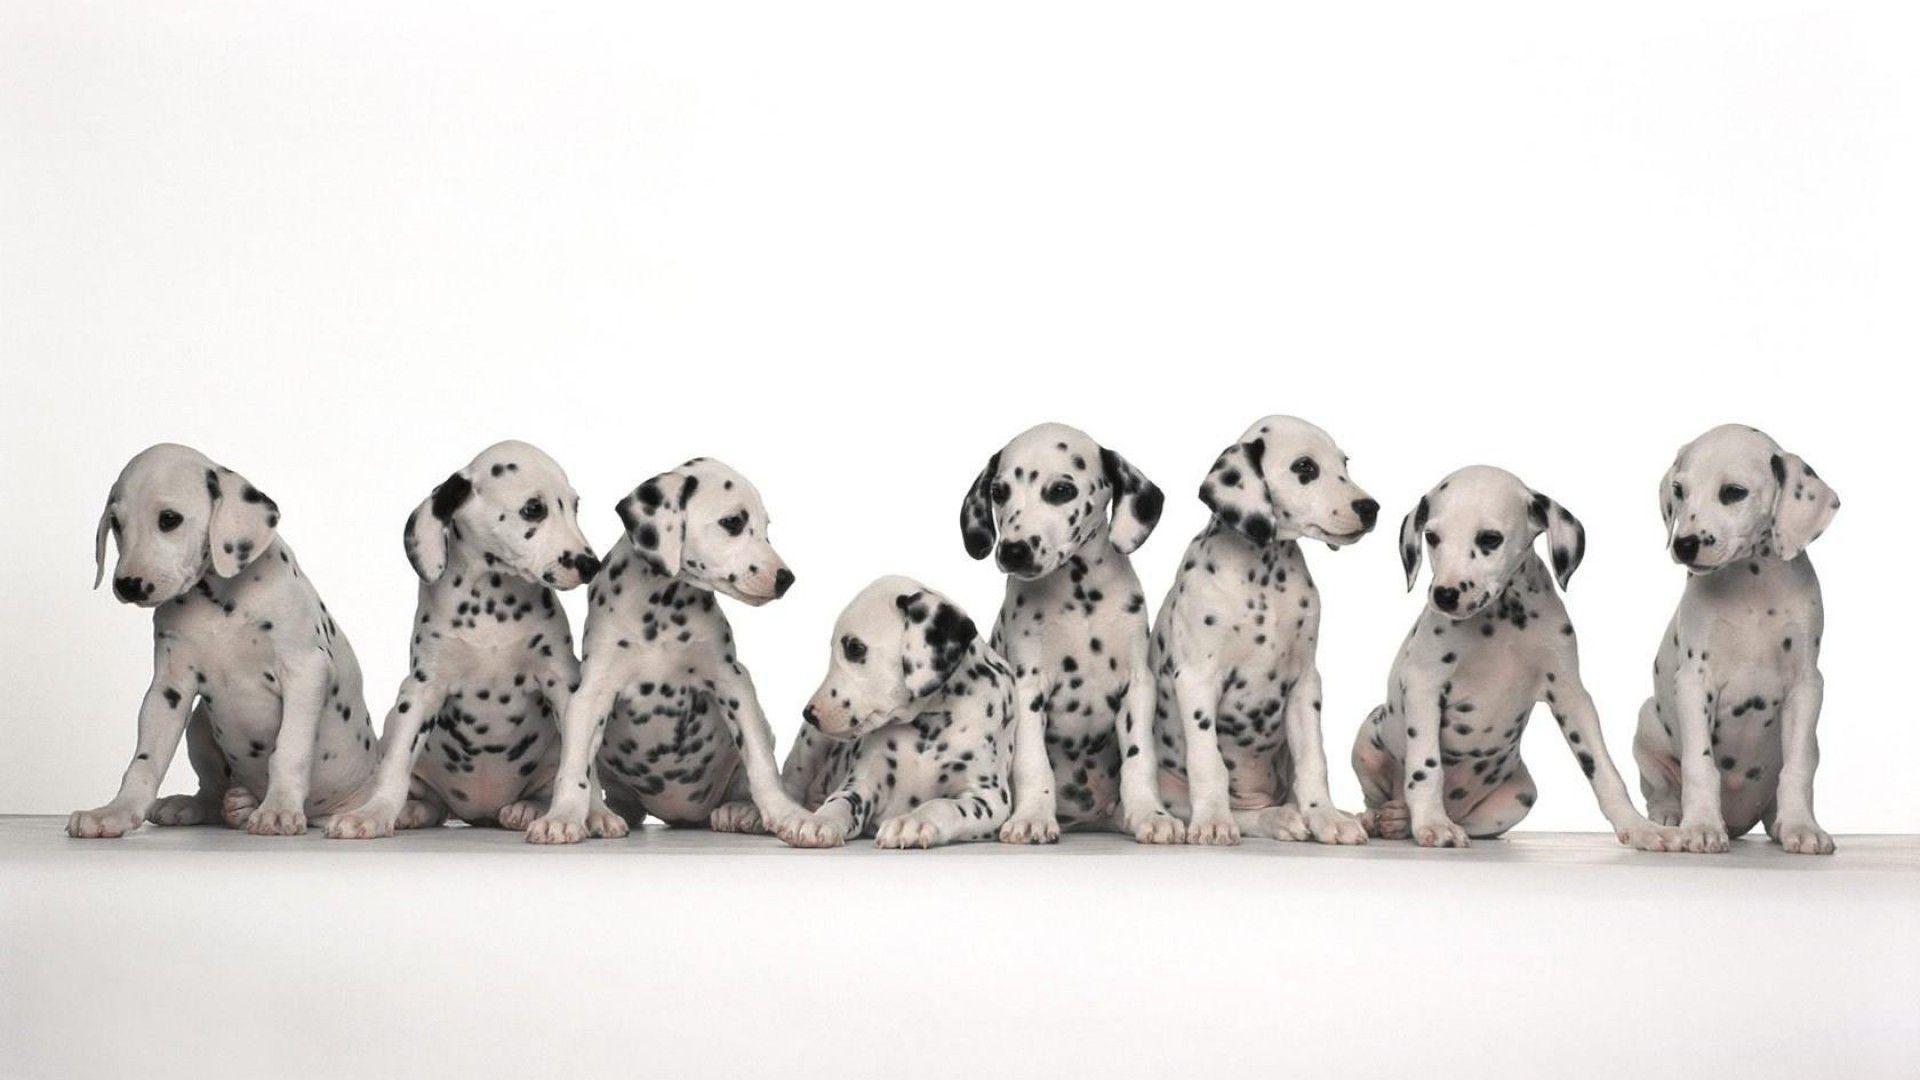 Hd wallpaper dog - Image For Dog Breeds Cute Dekstop Hd Wallpaper